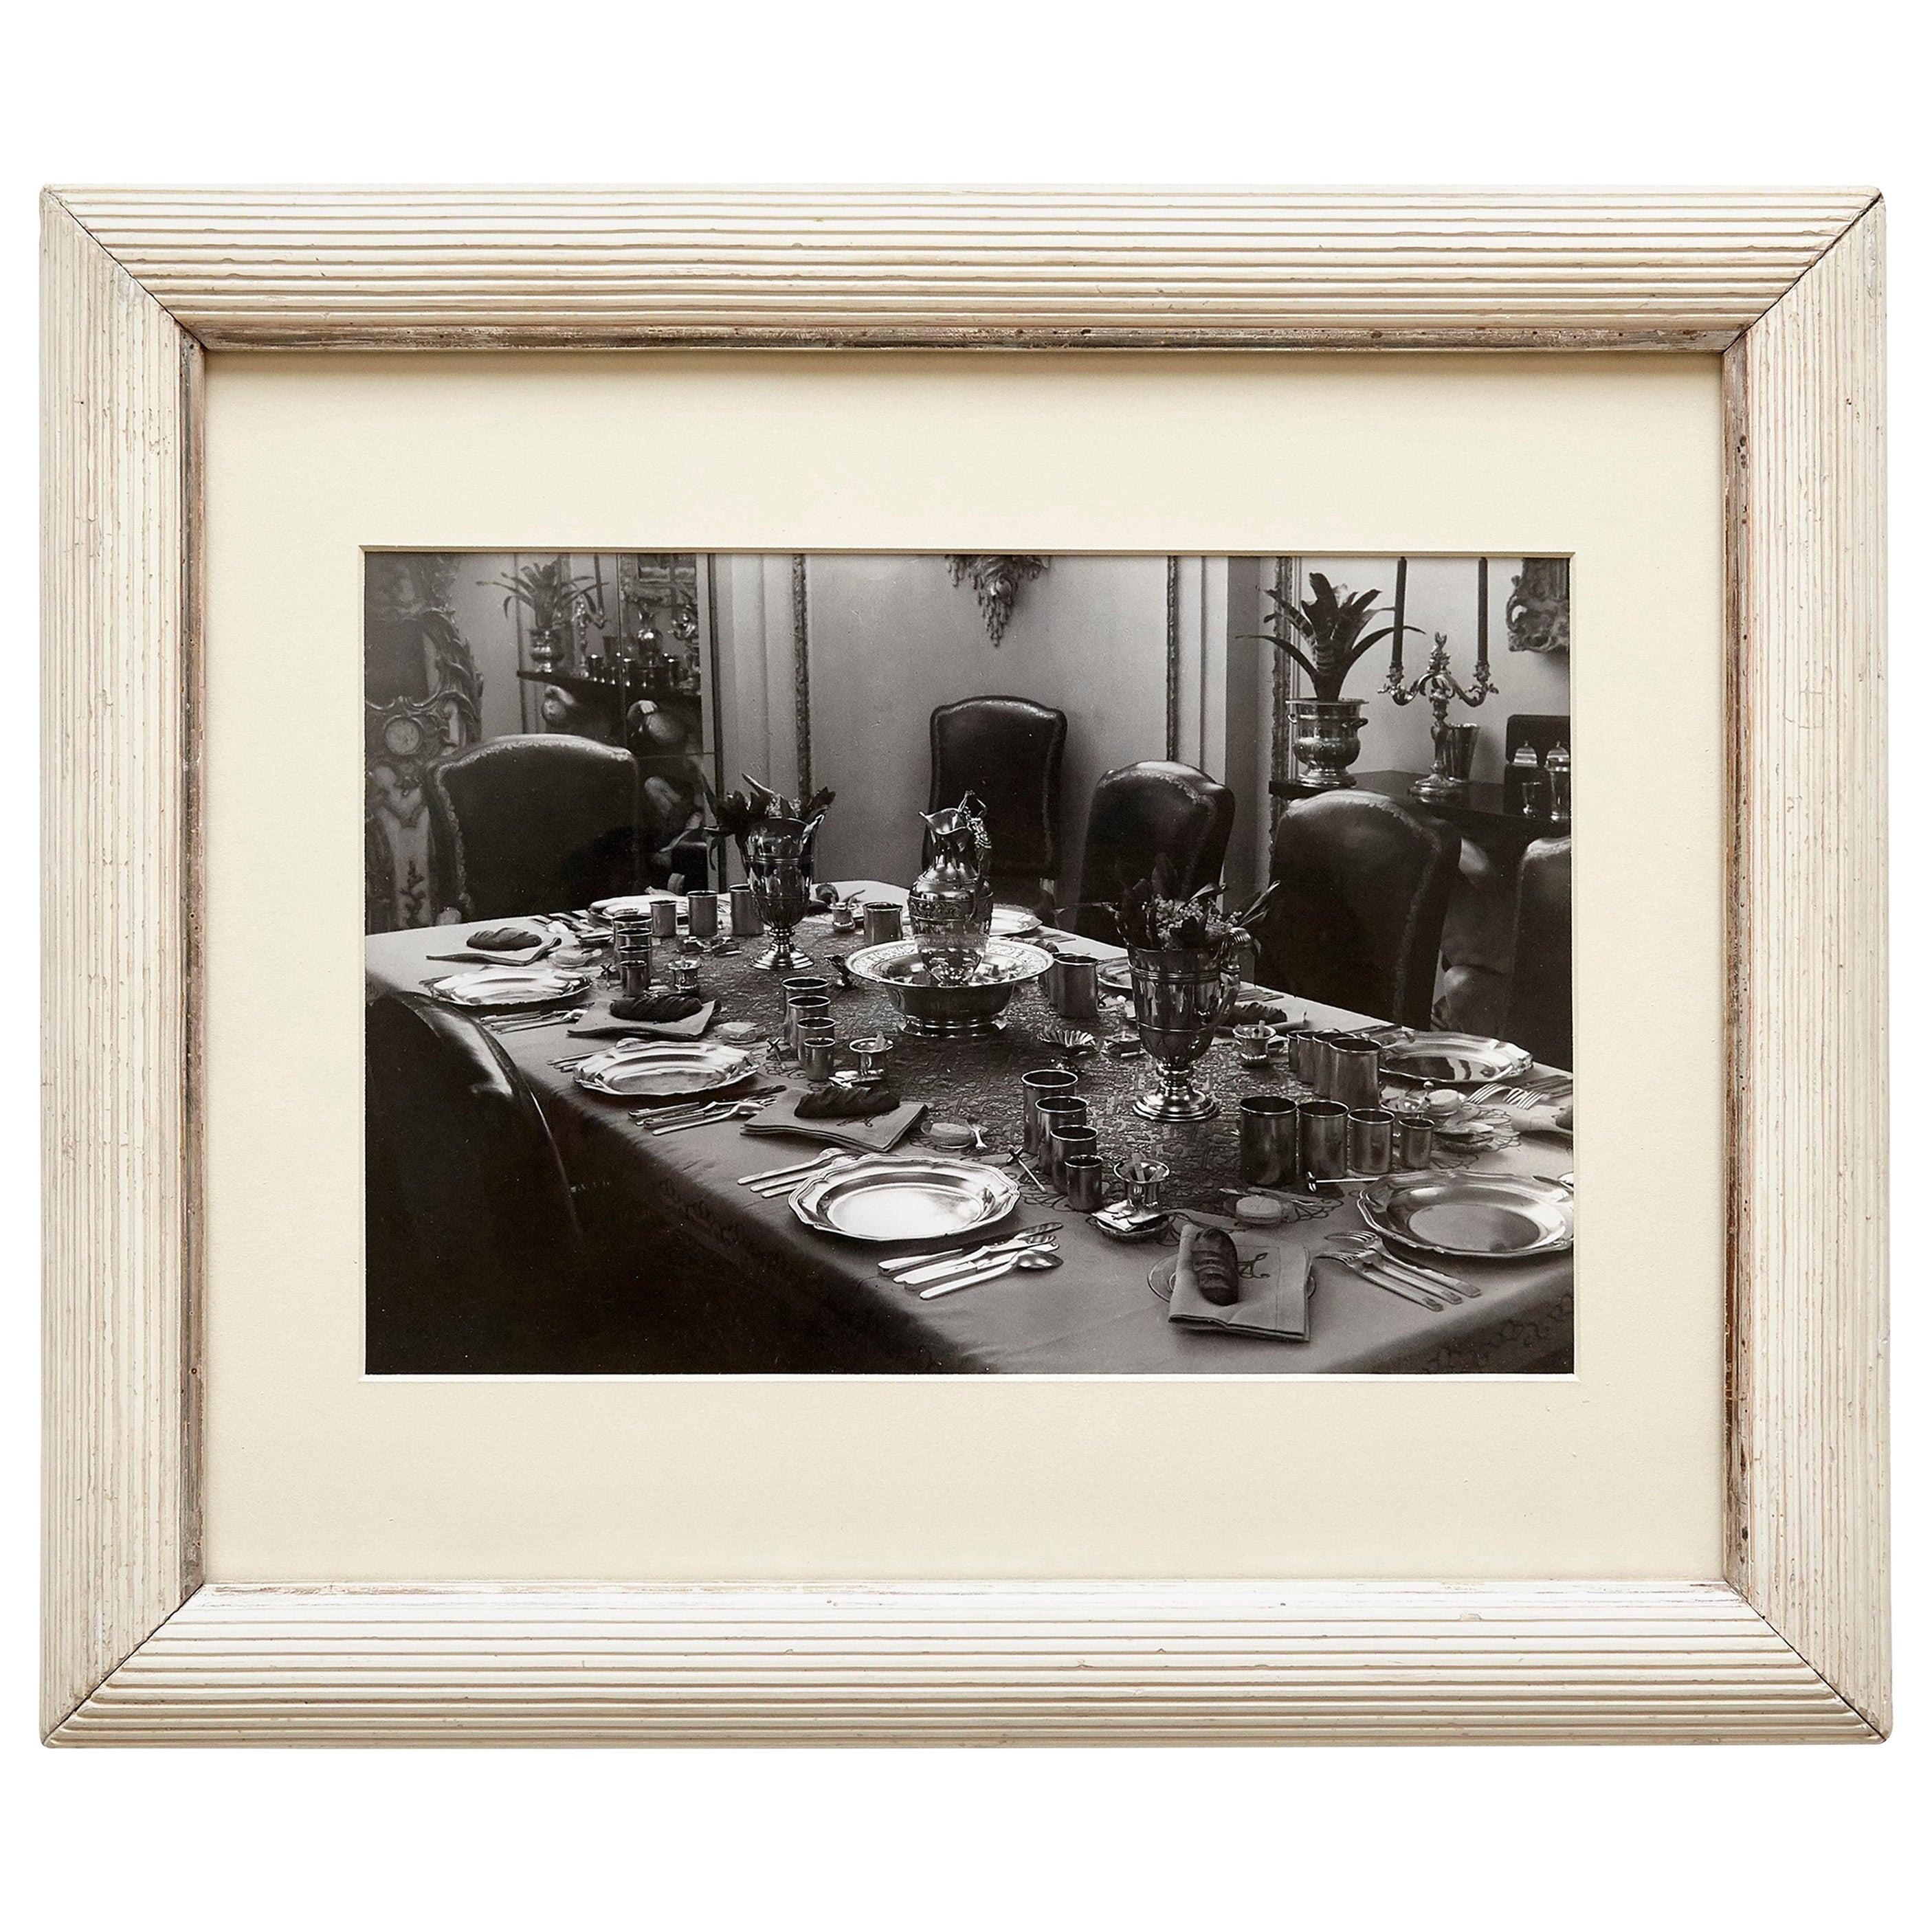 Brassai Black and White Photography of an Interior, circa 1936